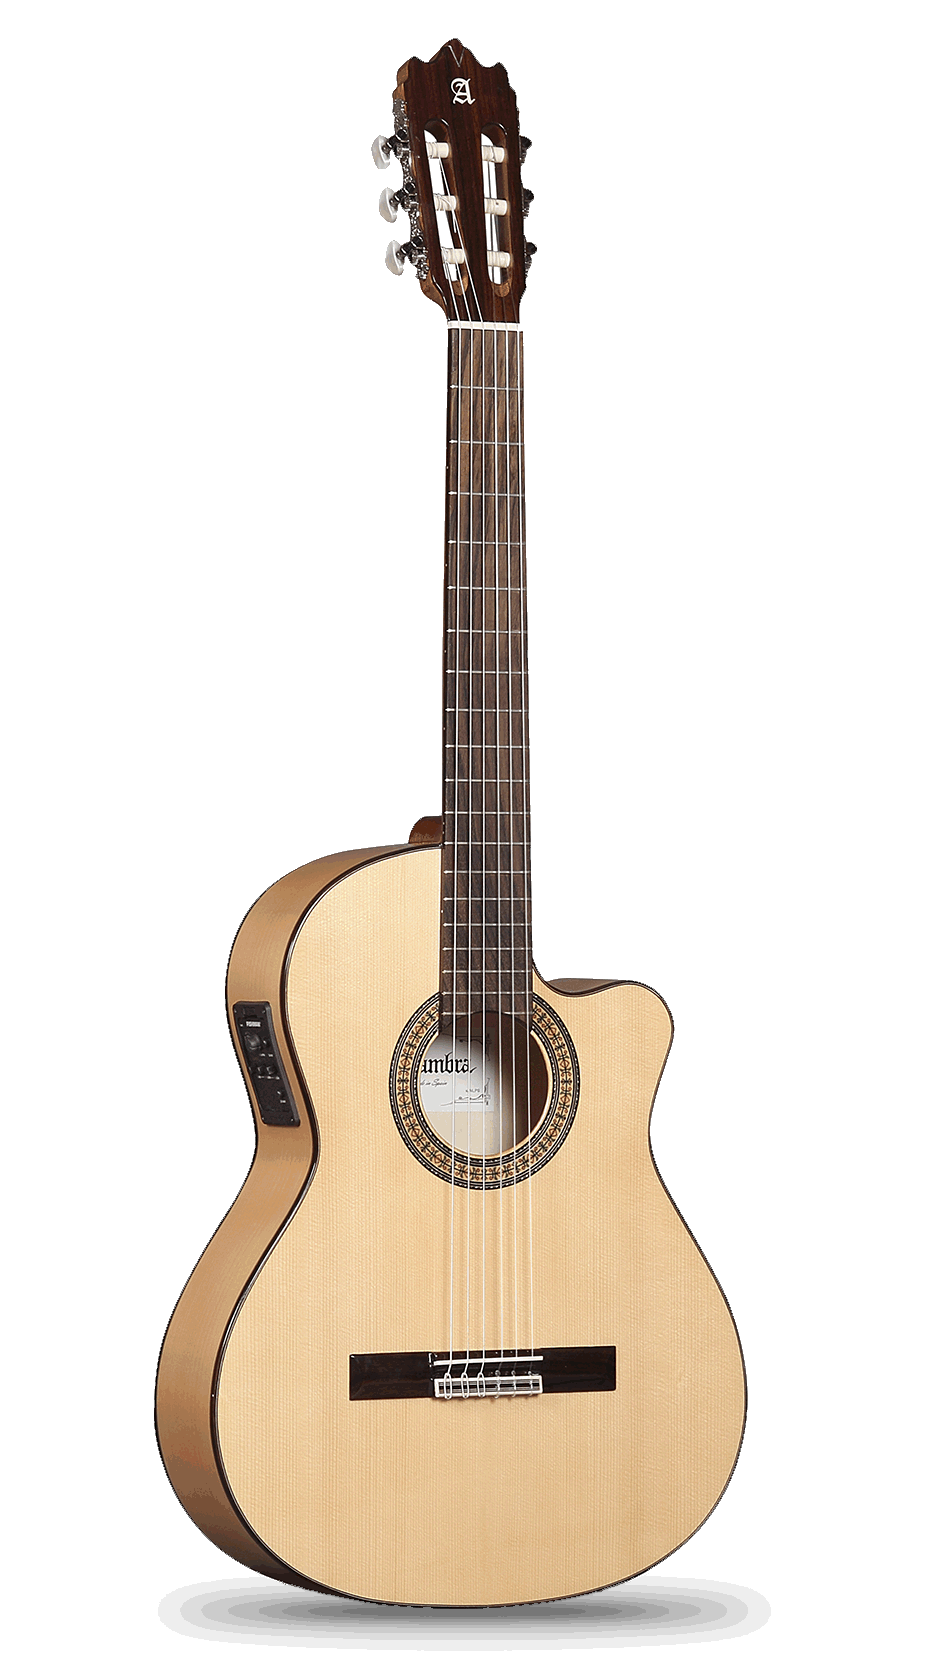 Guitarras Alhambra Étude